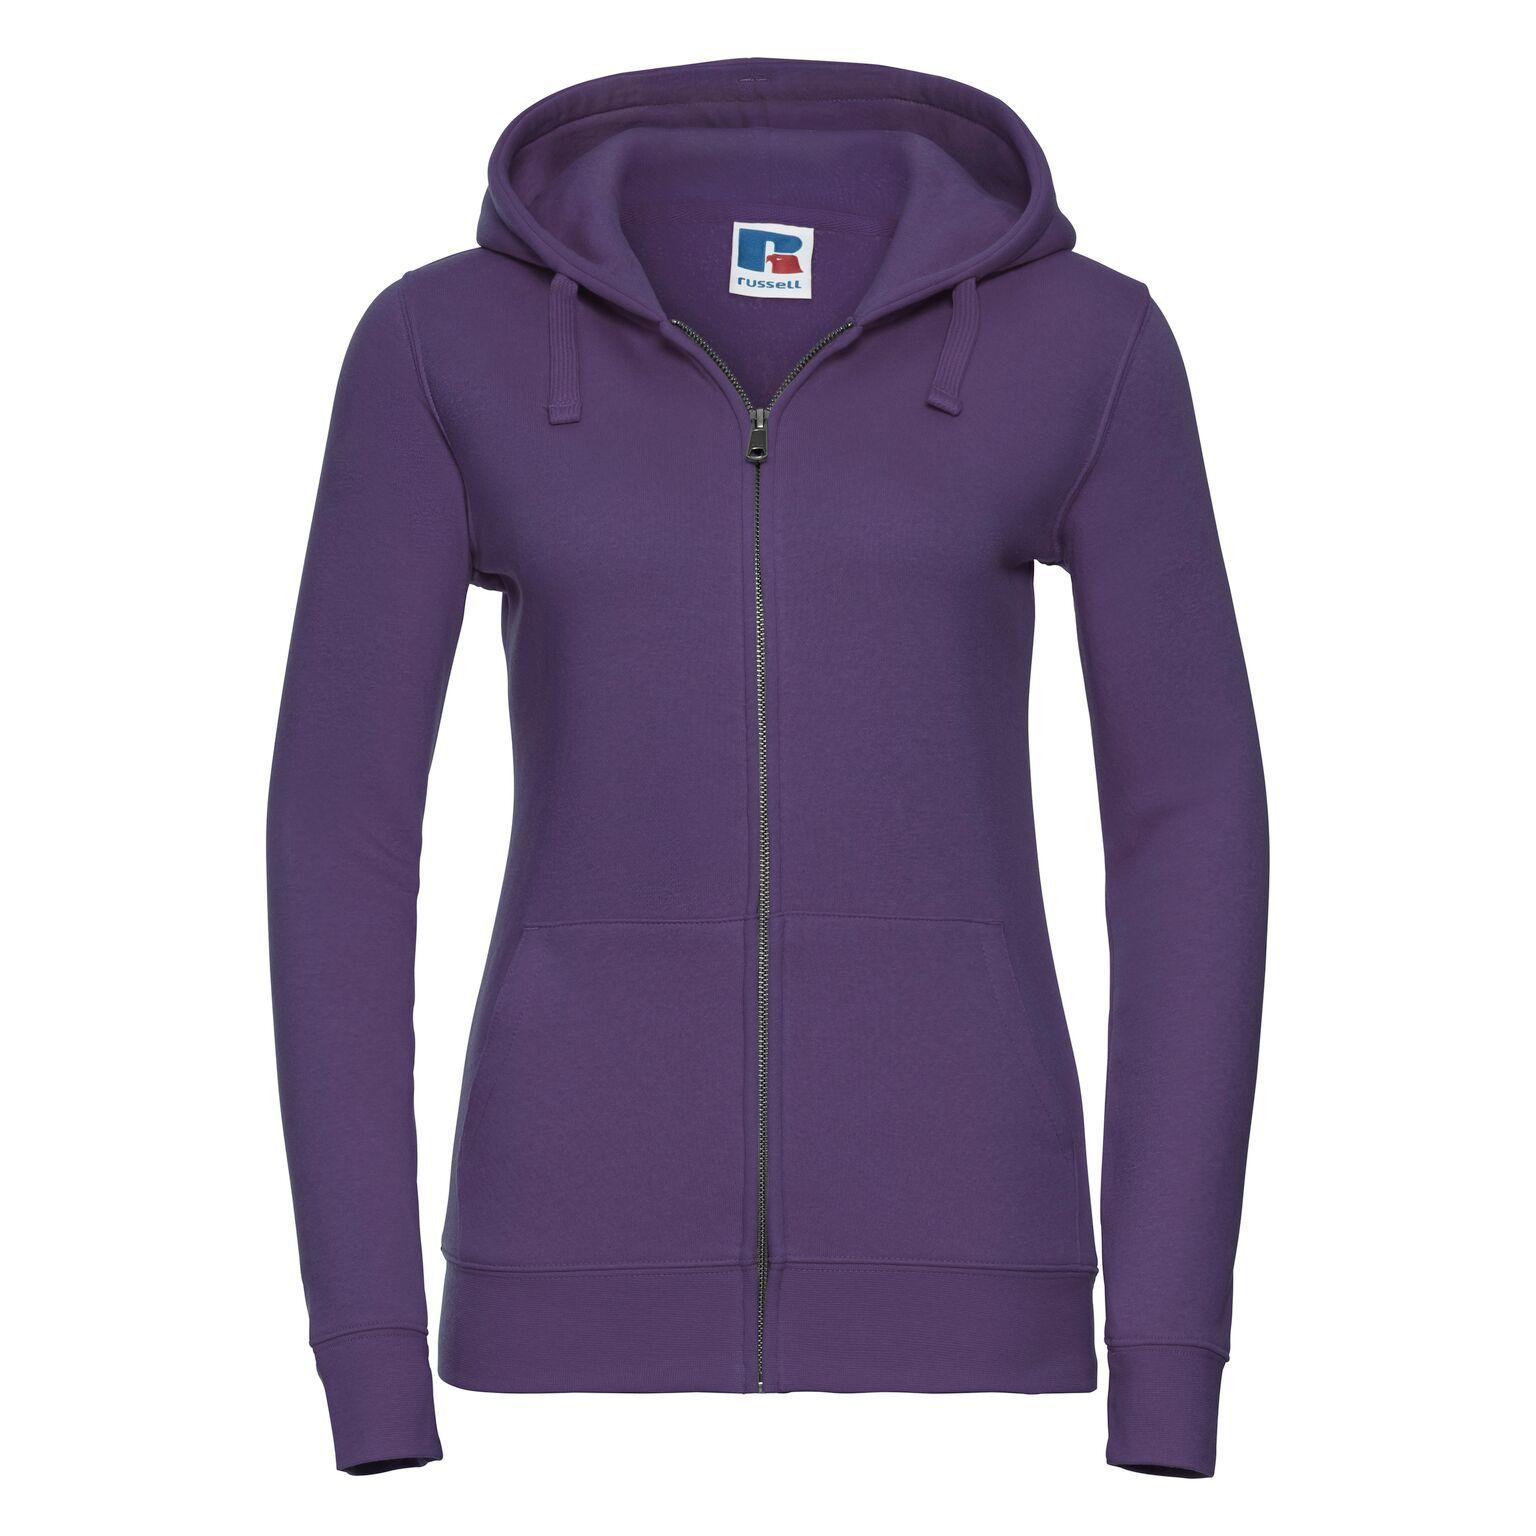 01_j266f_violet--0-0--5281e05c-e93e-4b74-b2be-cb0f99cc4df6